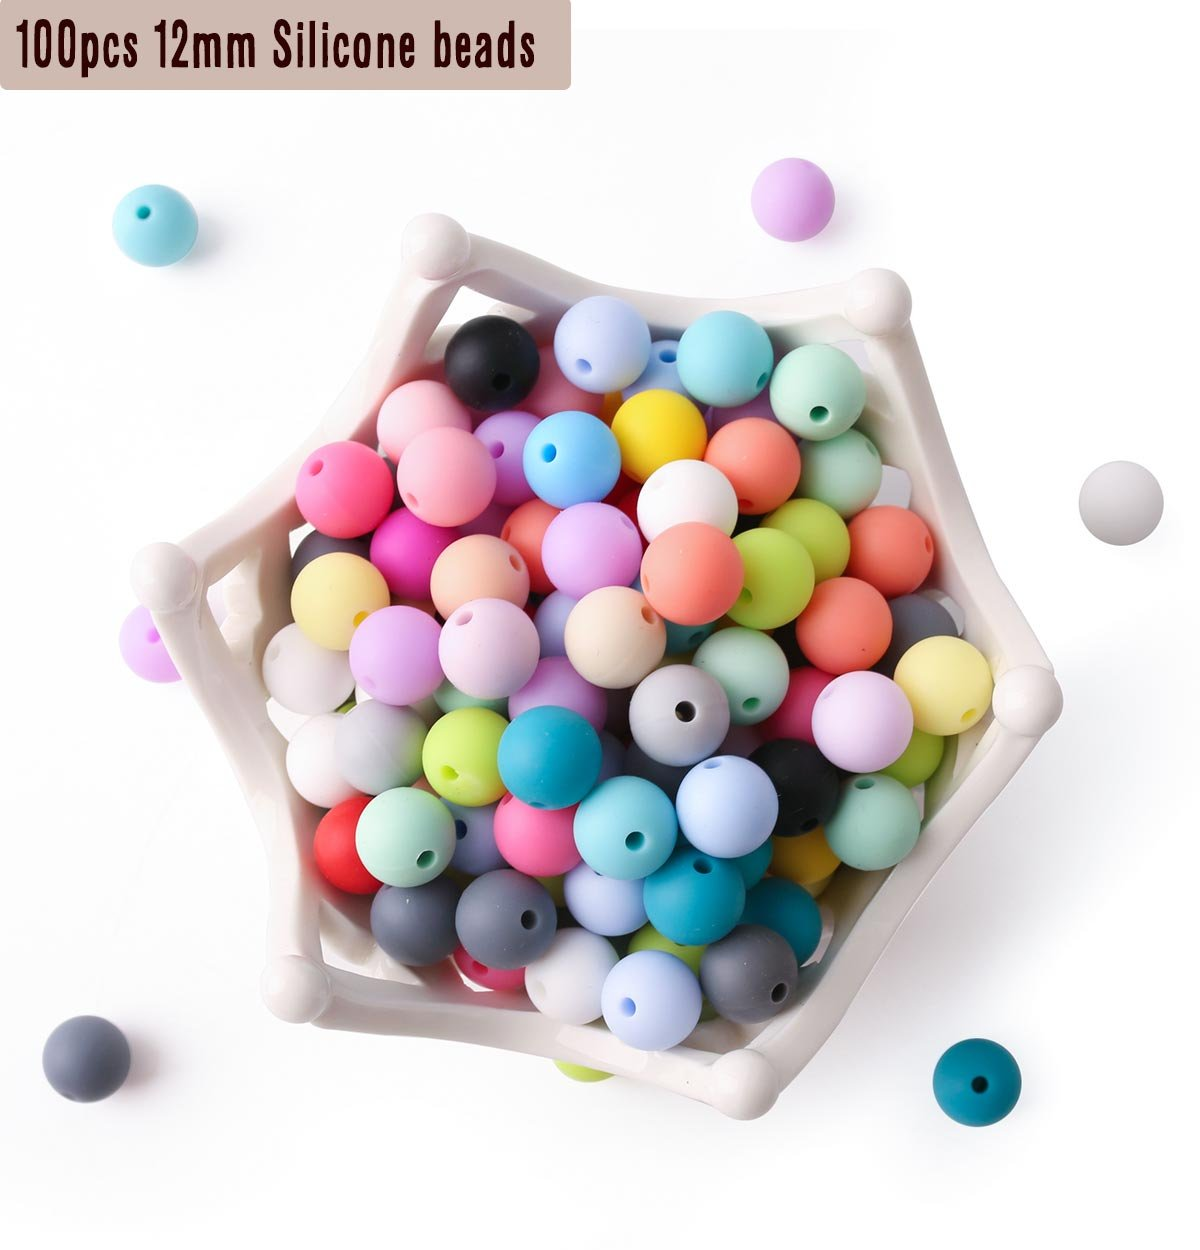 100pc 12mm Silicone Beads Loose Teething Chew Jewelry Teething Bracelet Teether Toy DIY Supplies DIY Jewelry Nursing Necklace HAO JIE